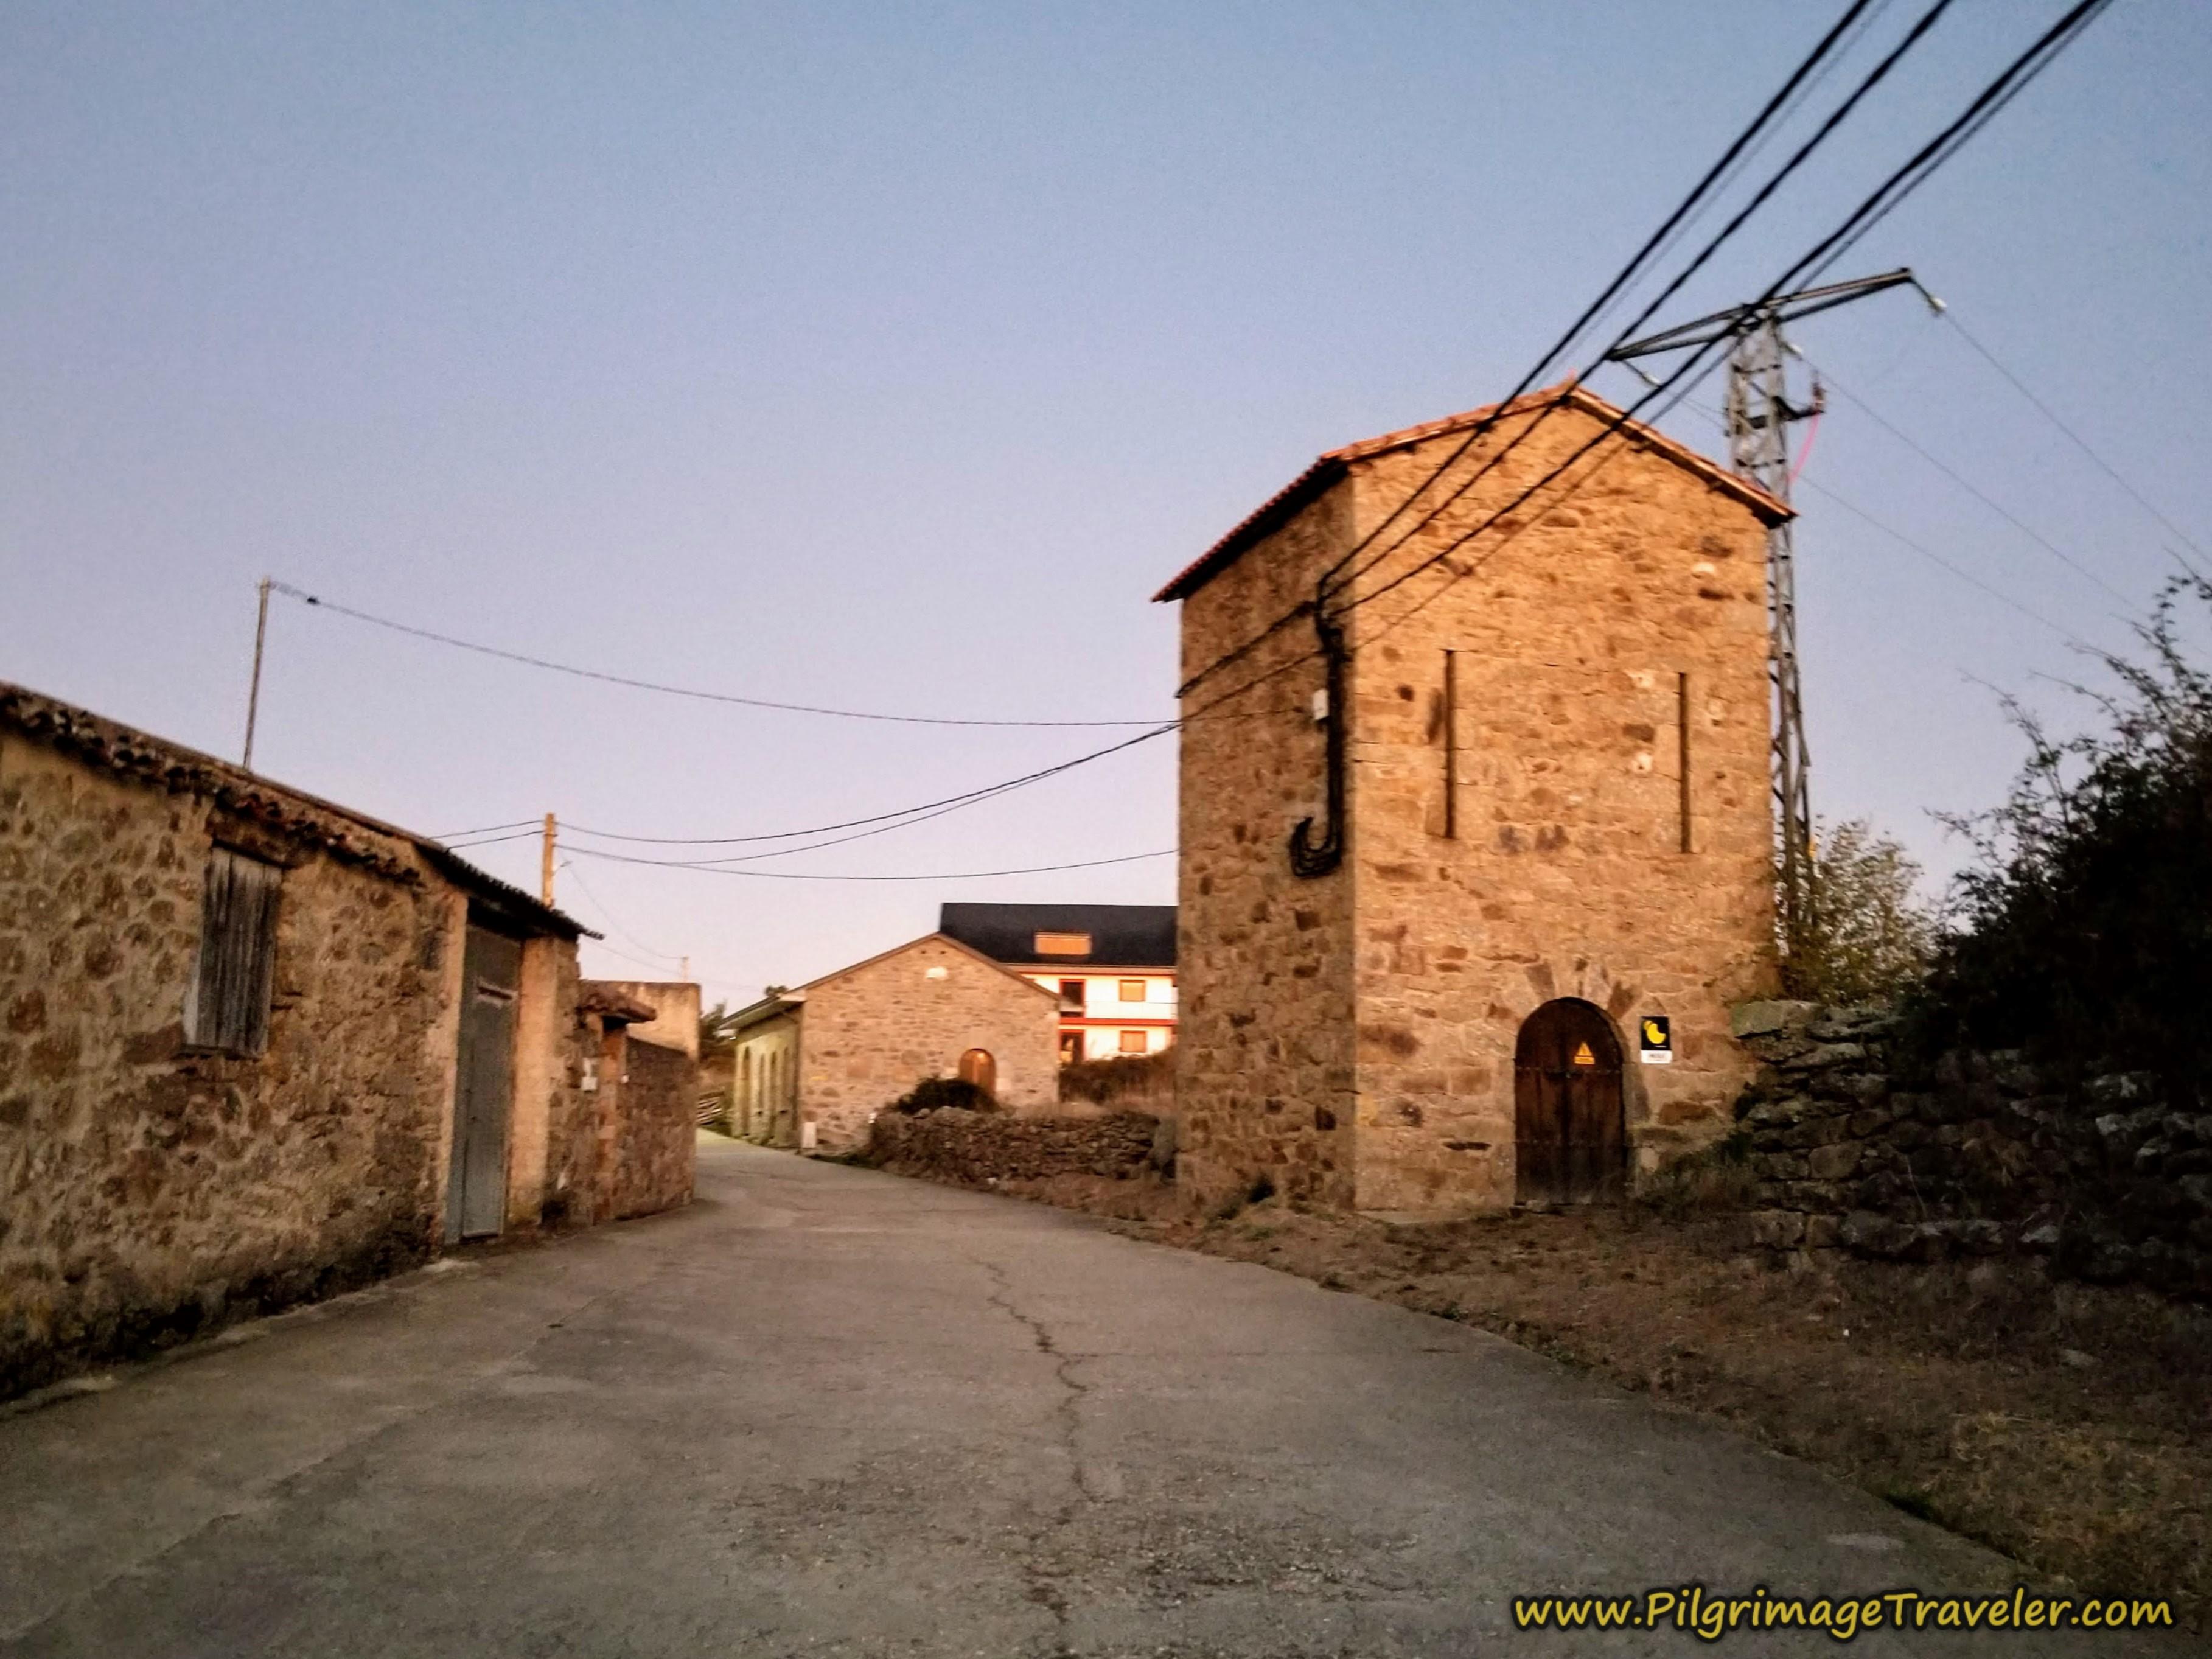 Leaving Rionegro del Puente at Daybreak on the Camino Sanabrés from Rionegro del Puente to Entrepeñas